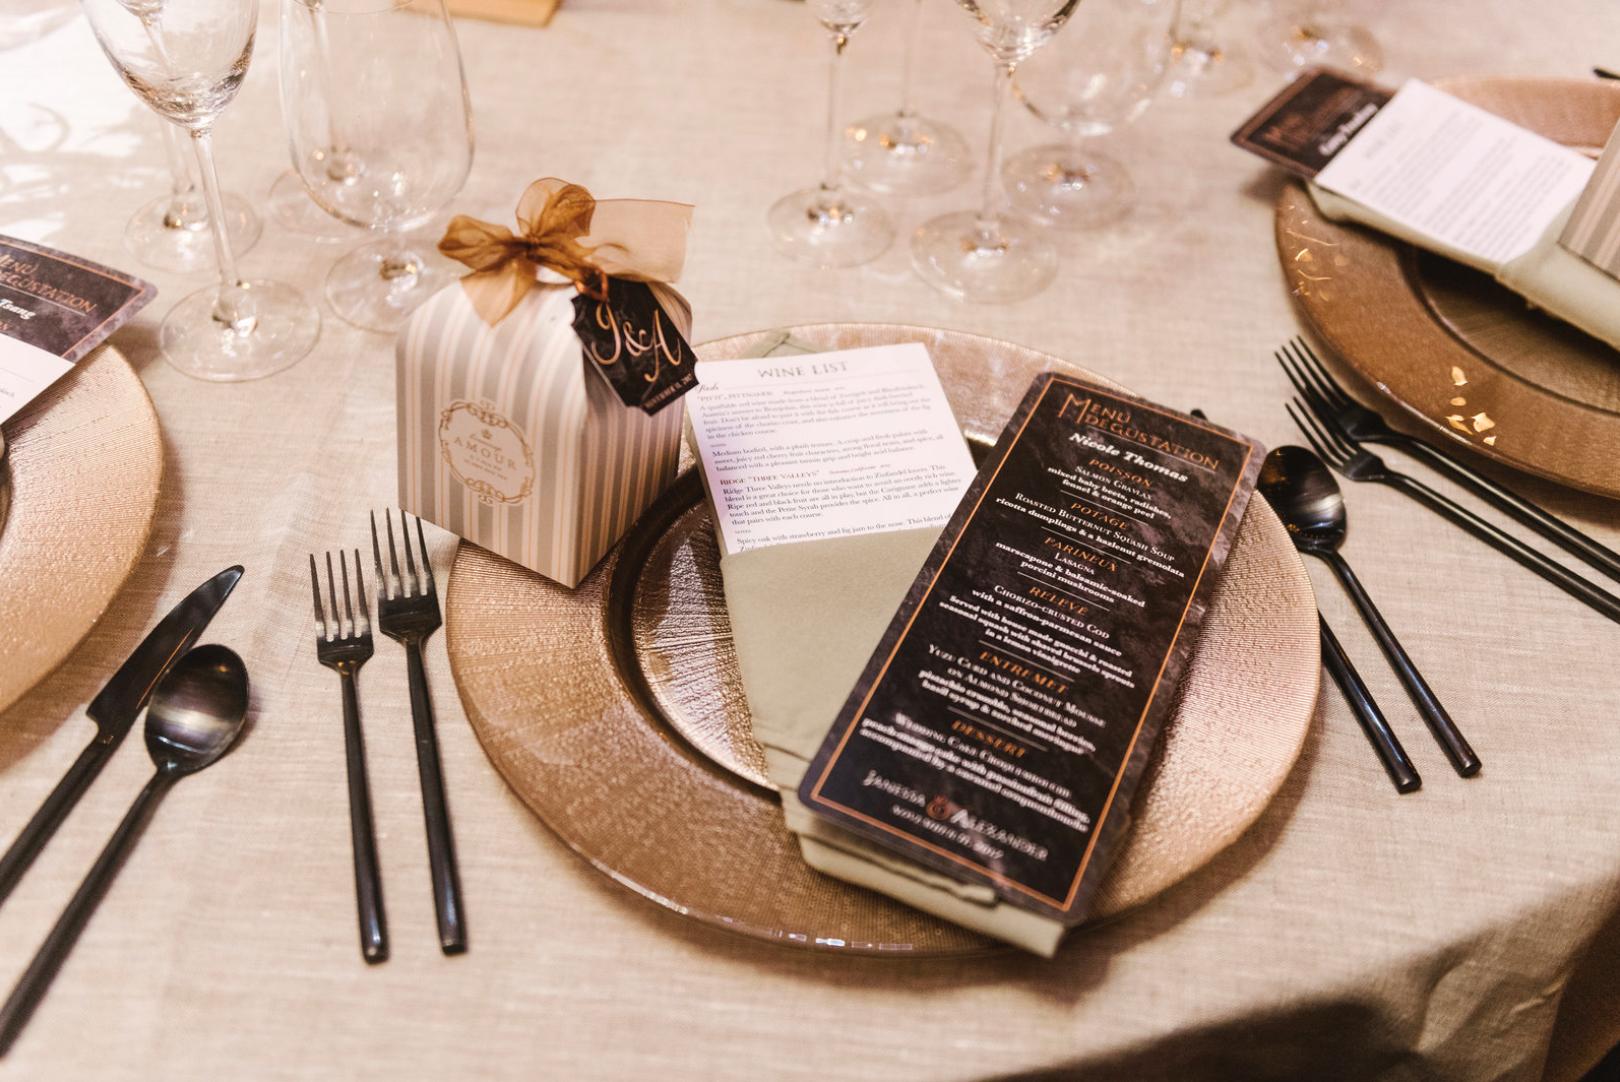 alex-janessa-wedding-table-setting